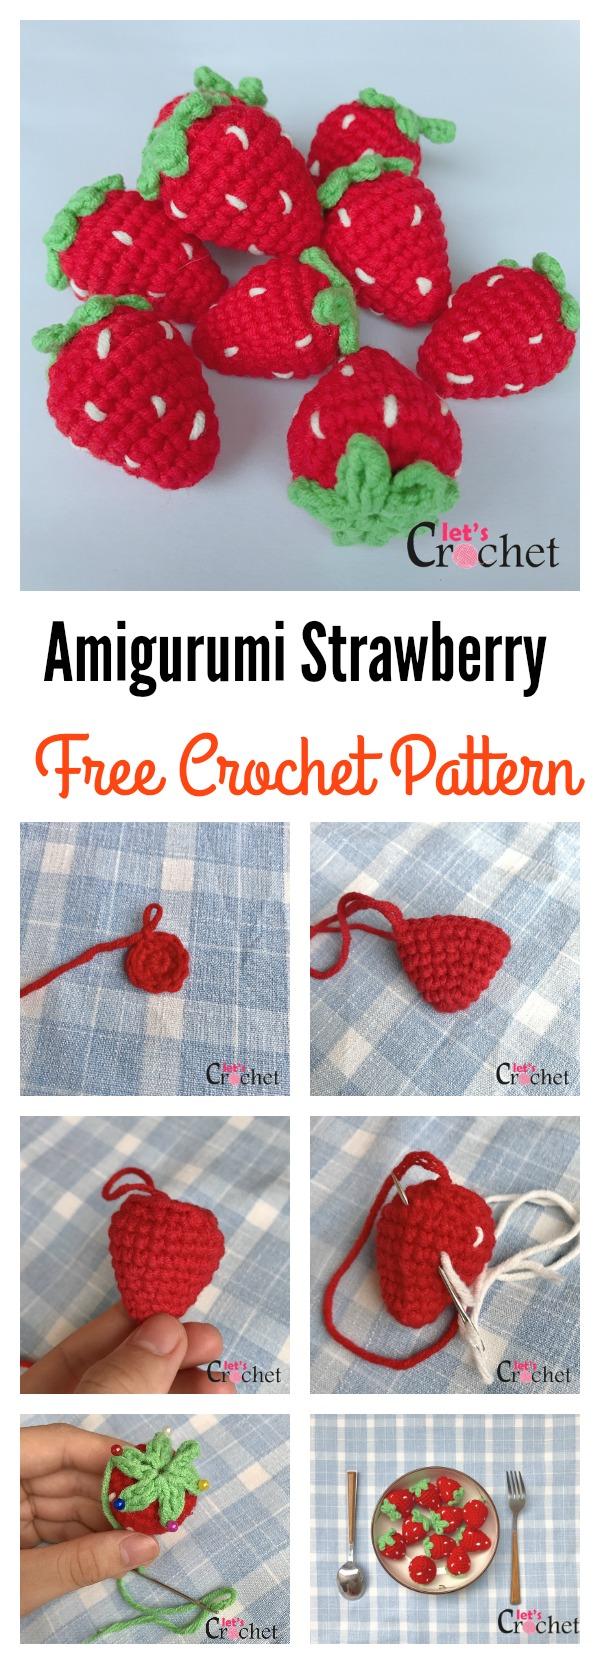 Adorable Amigurumi Strawberry Free Crochet Pattern